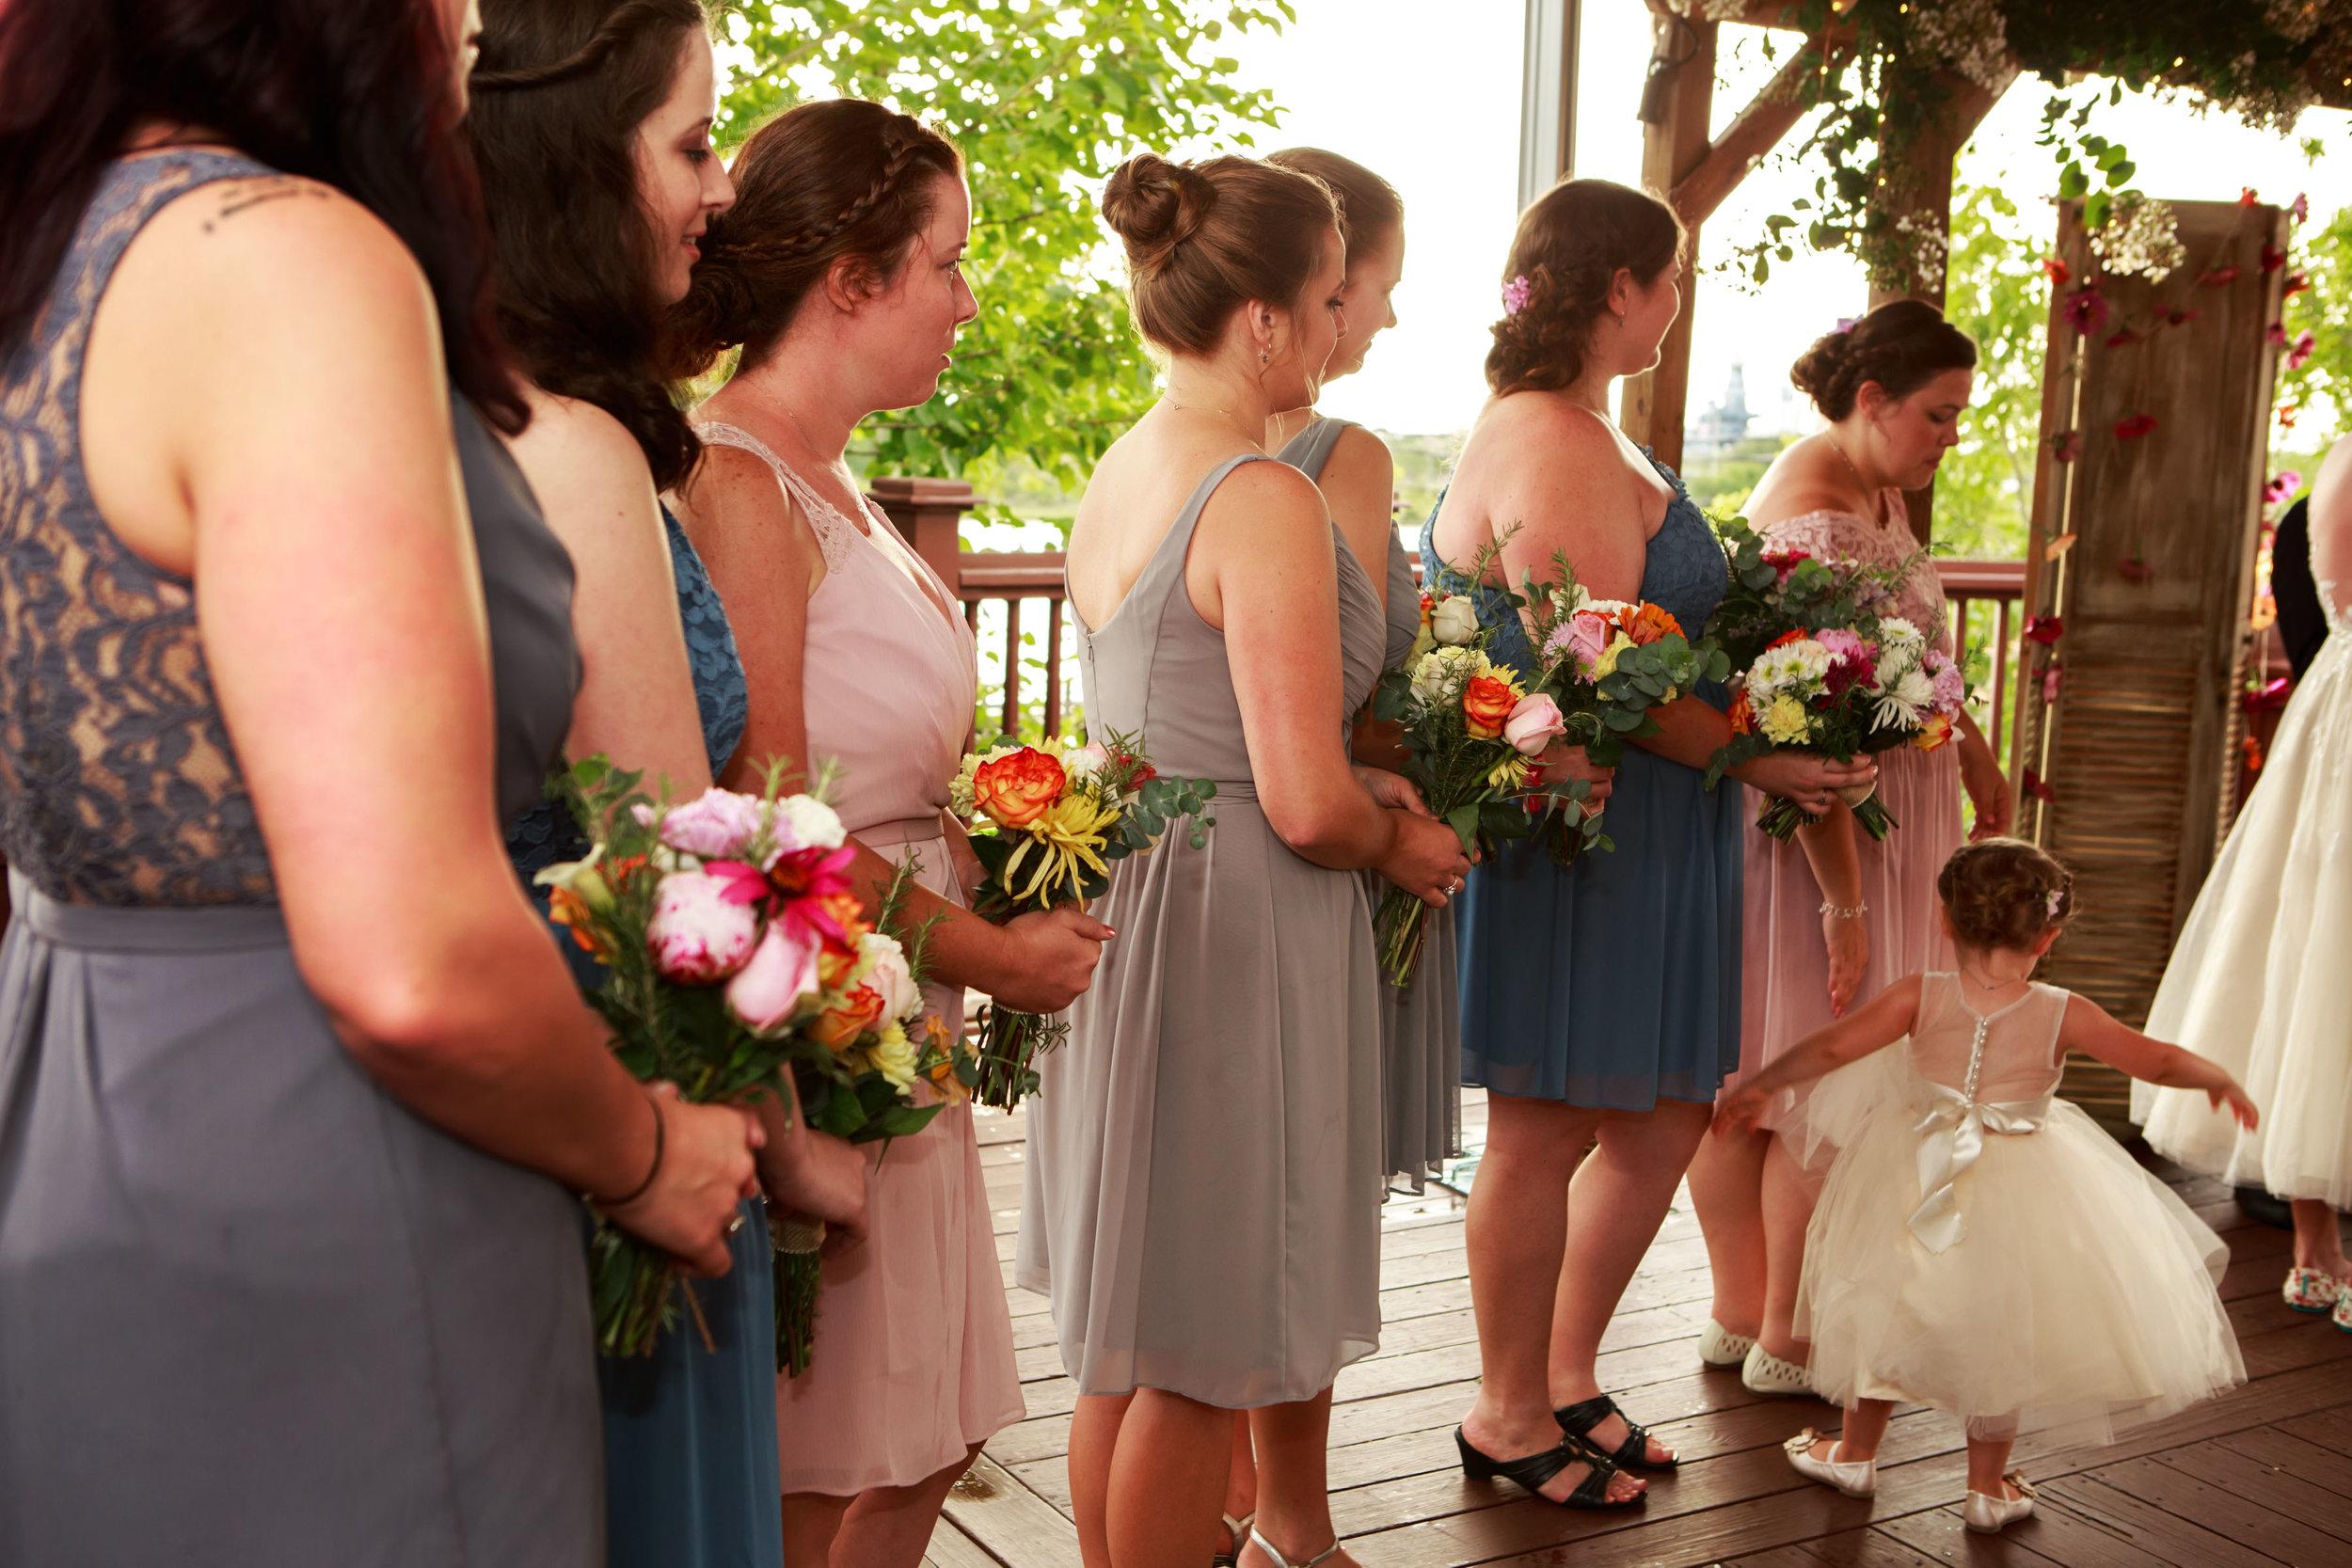 128-South-Wedding-Wilmington-NC-Photographer-Ceremony-16.5.jpg